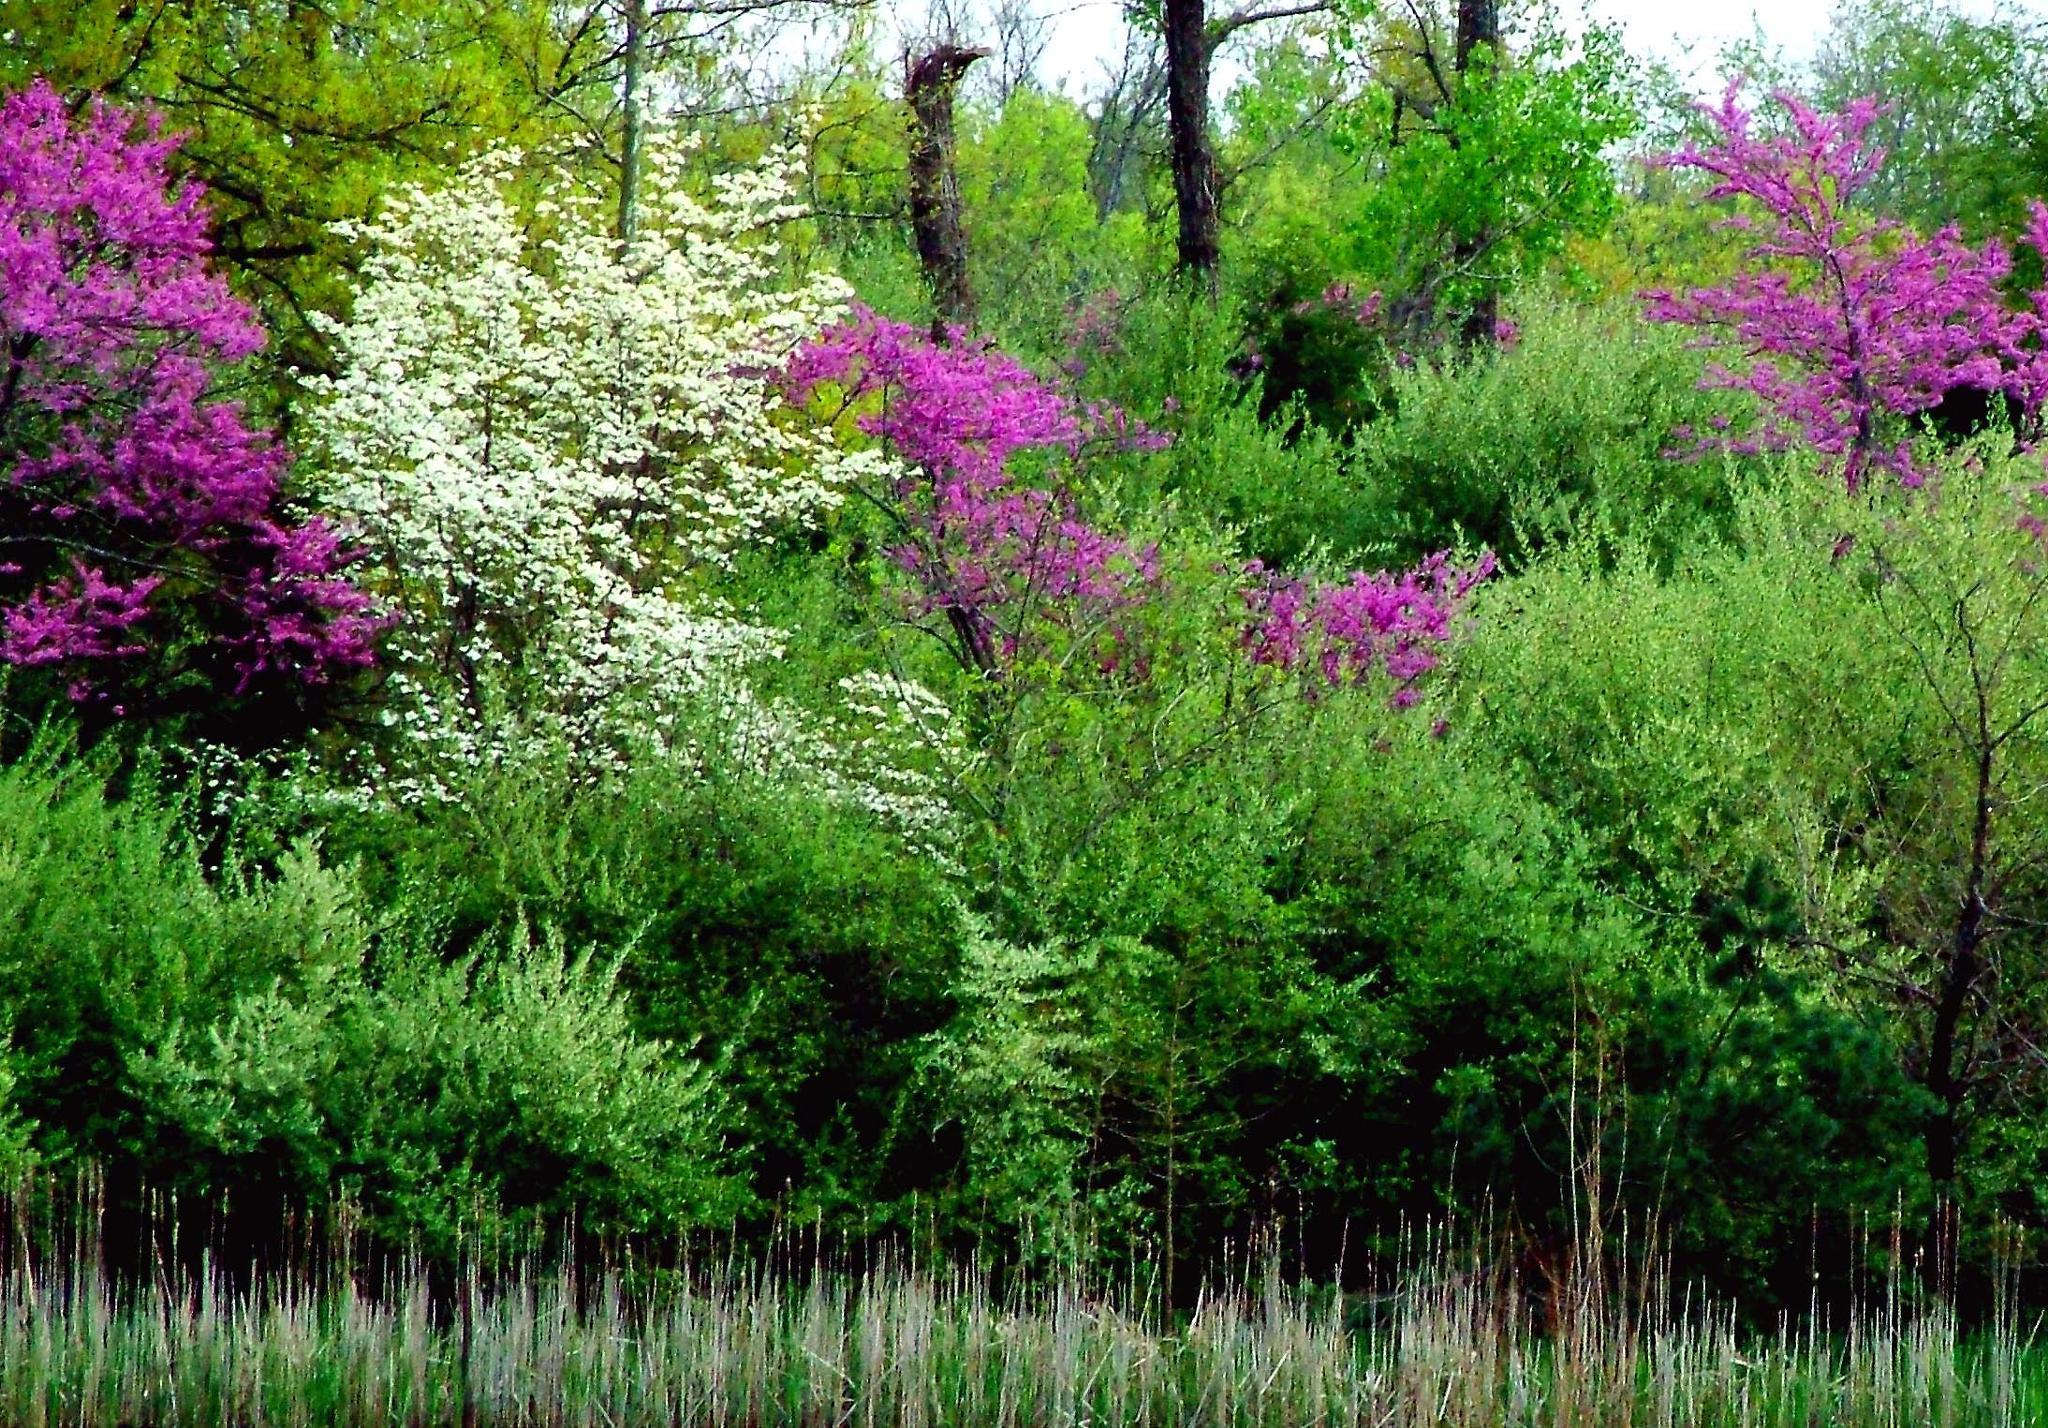 Springtime At Sleepy Hollow Pond 3 0f 3  Close Up by Lorenzo (Larry) Jonree